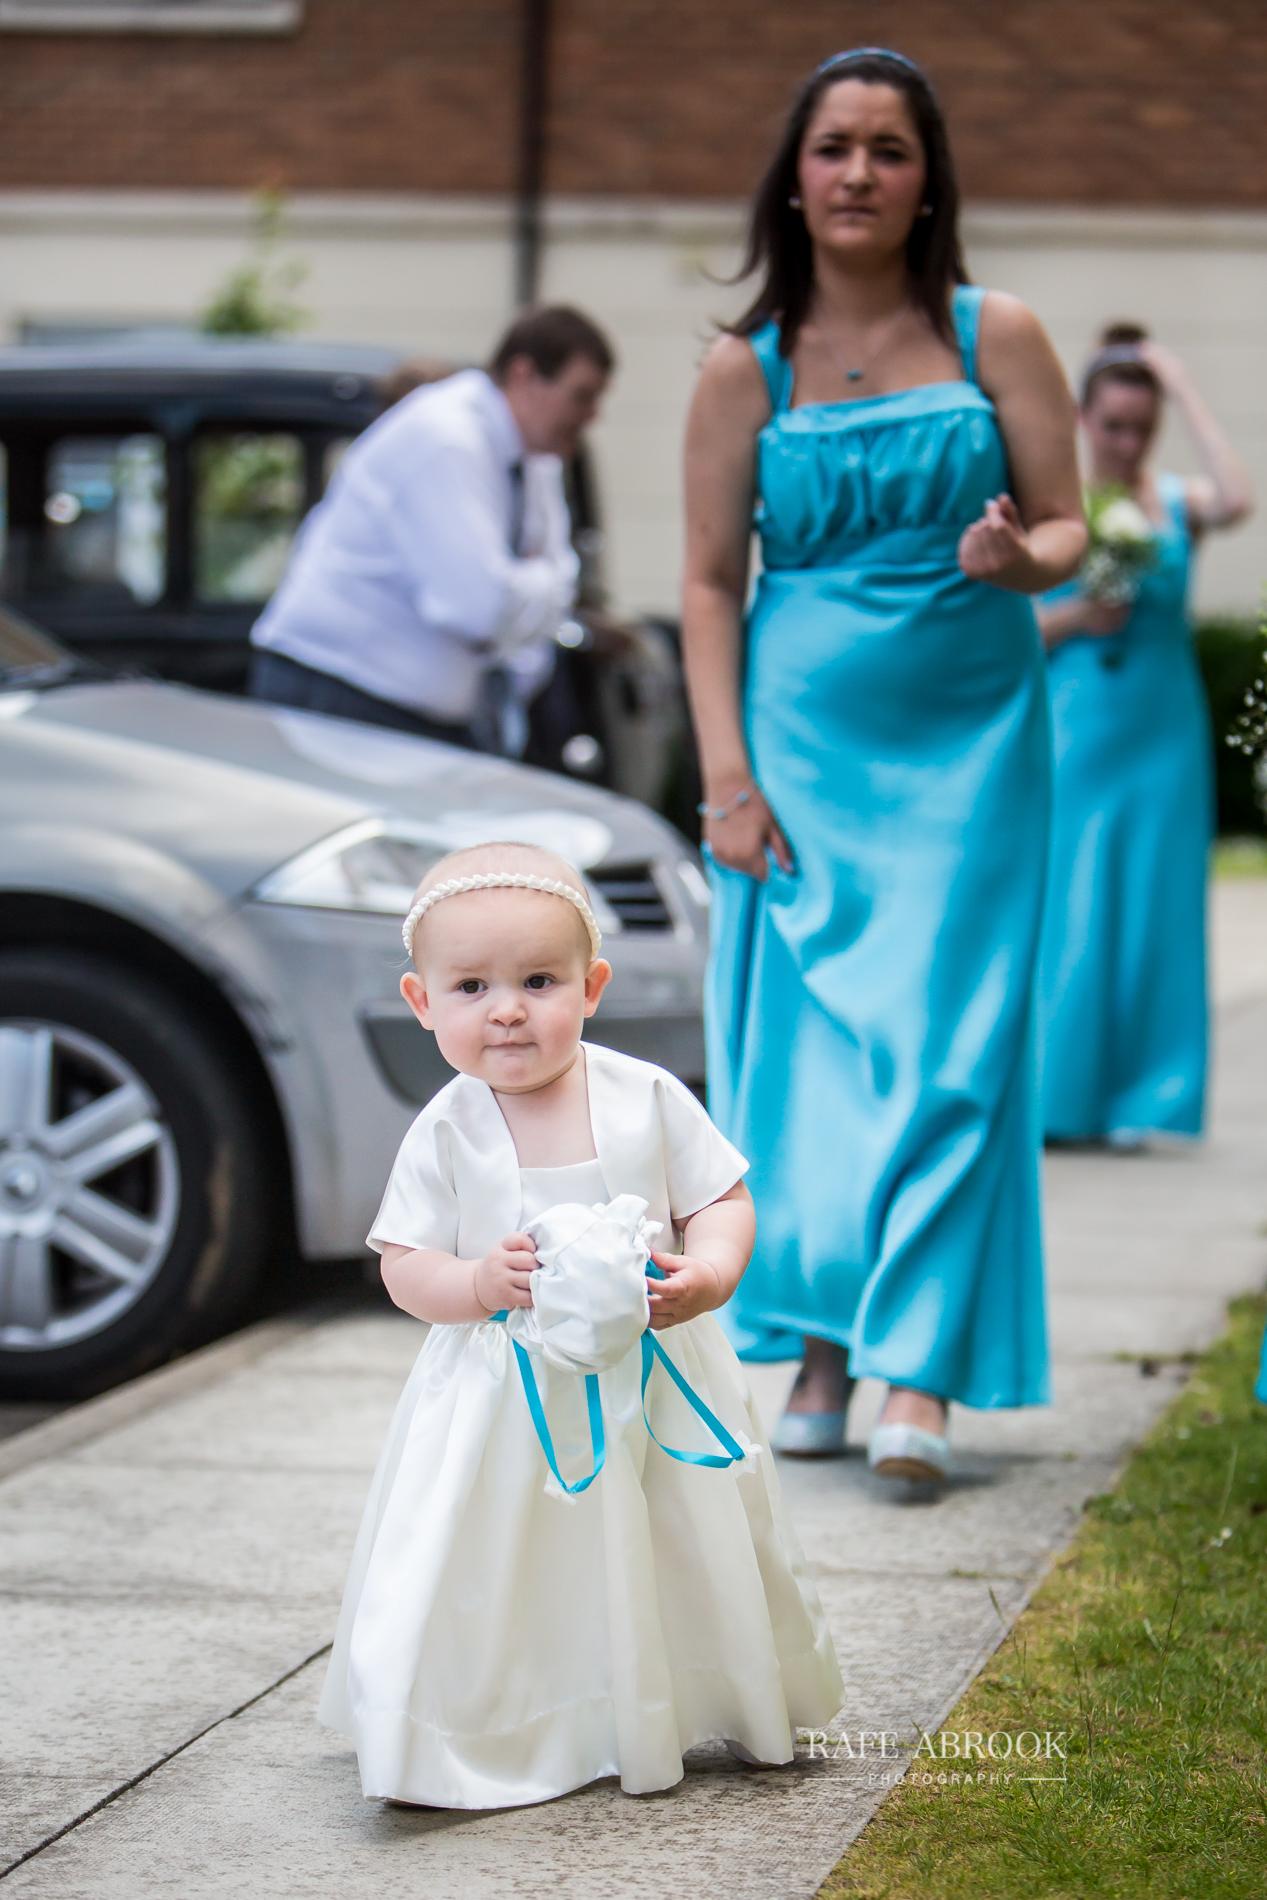 wedding photographer hertfordshire noke thistle hotel st albans -1082.jpg